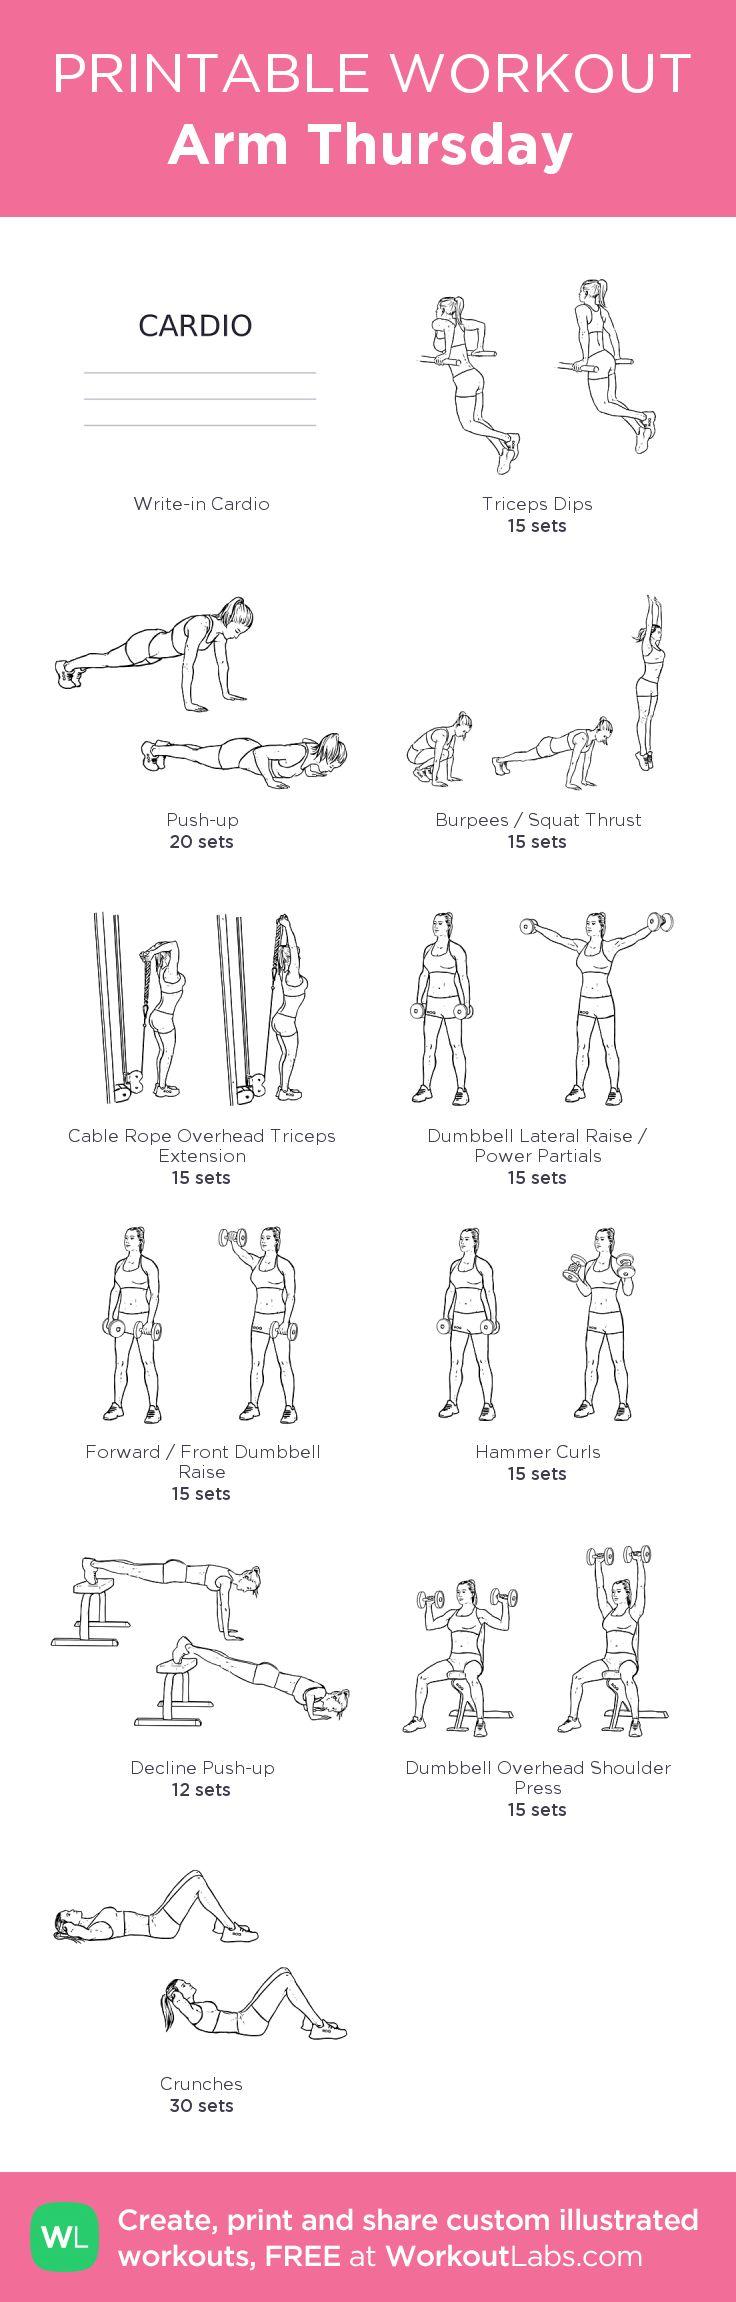 the arm jeff passan pdf